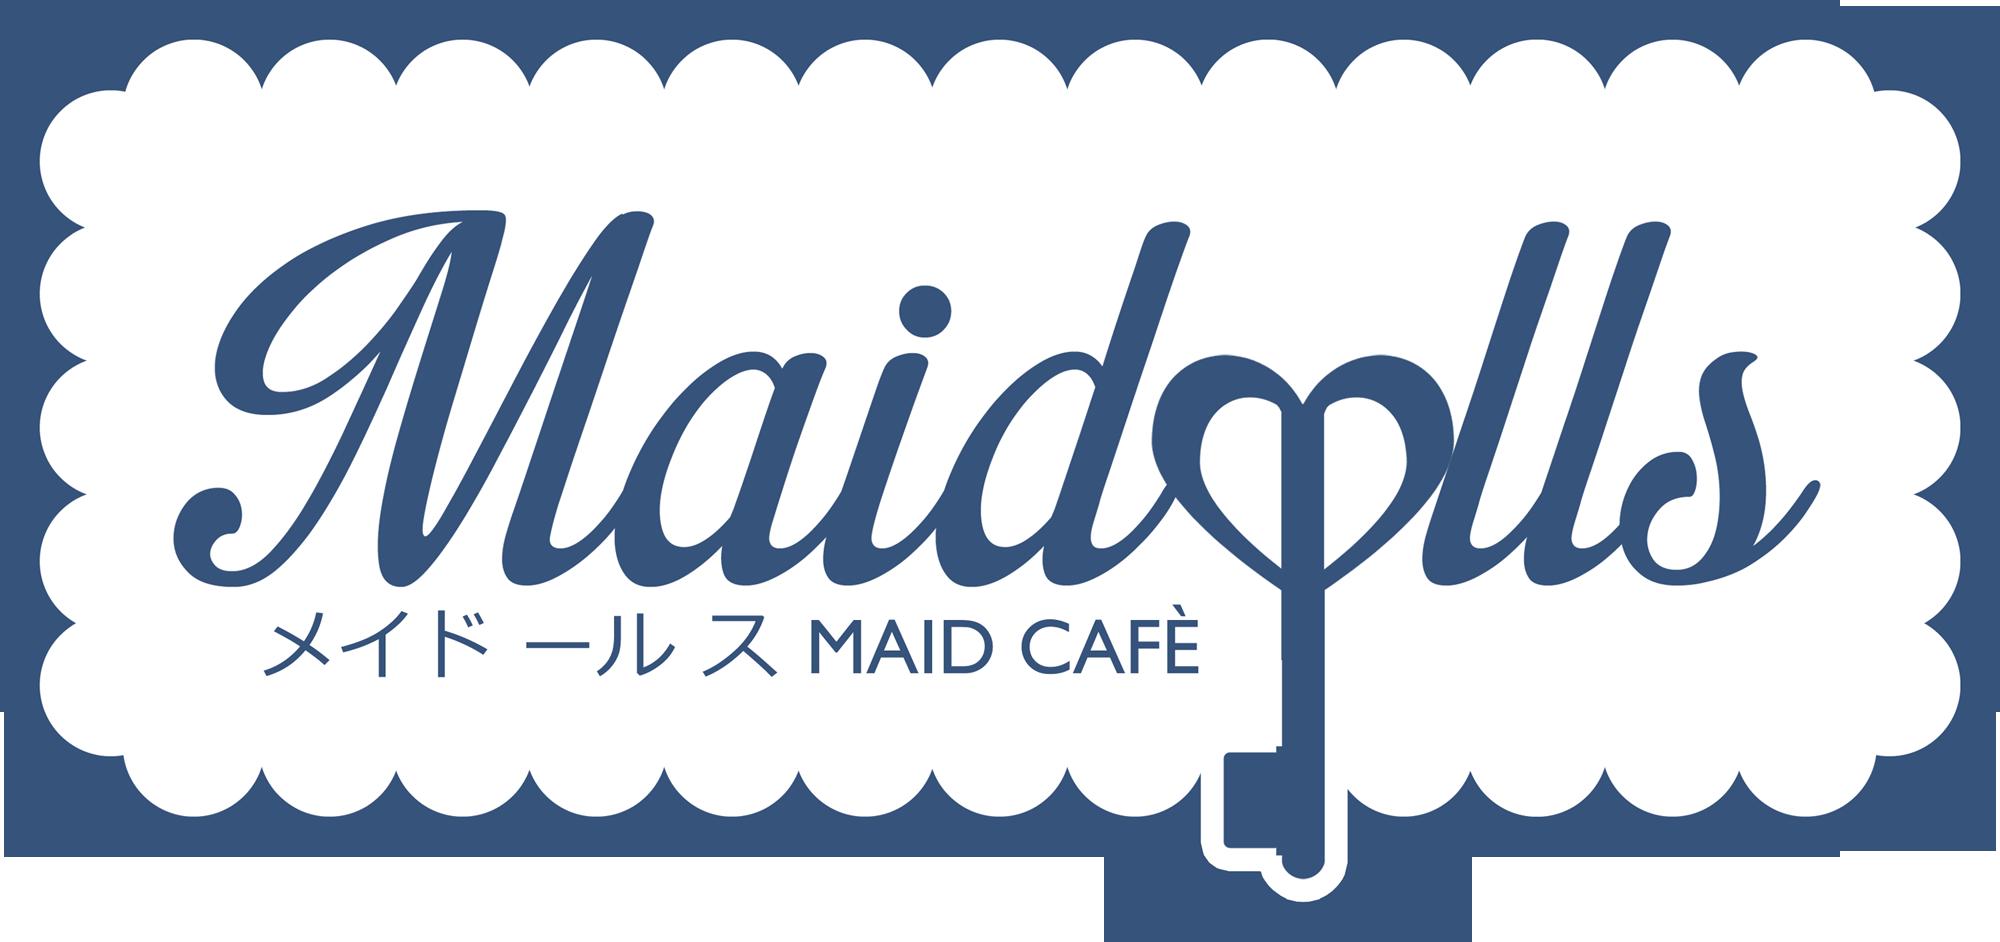 maidolls logo